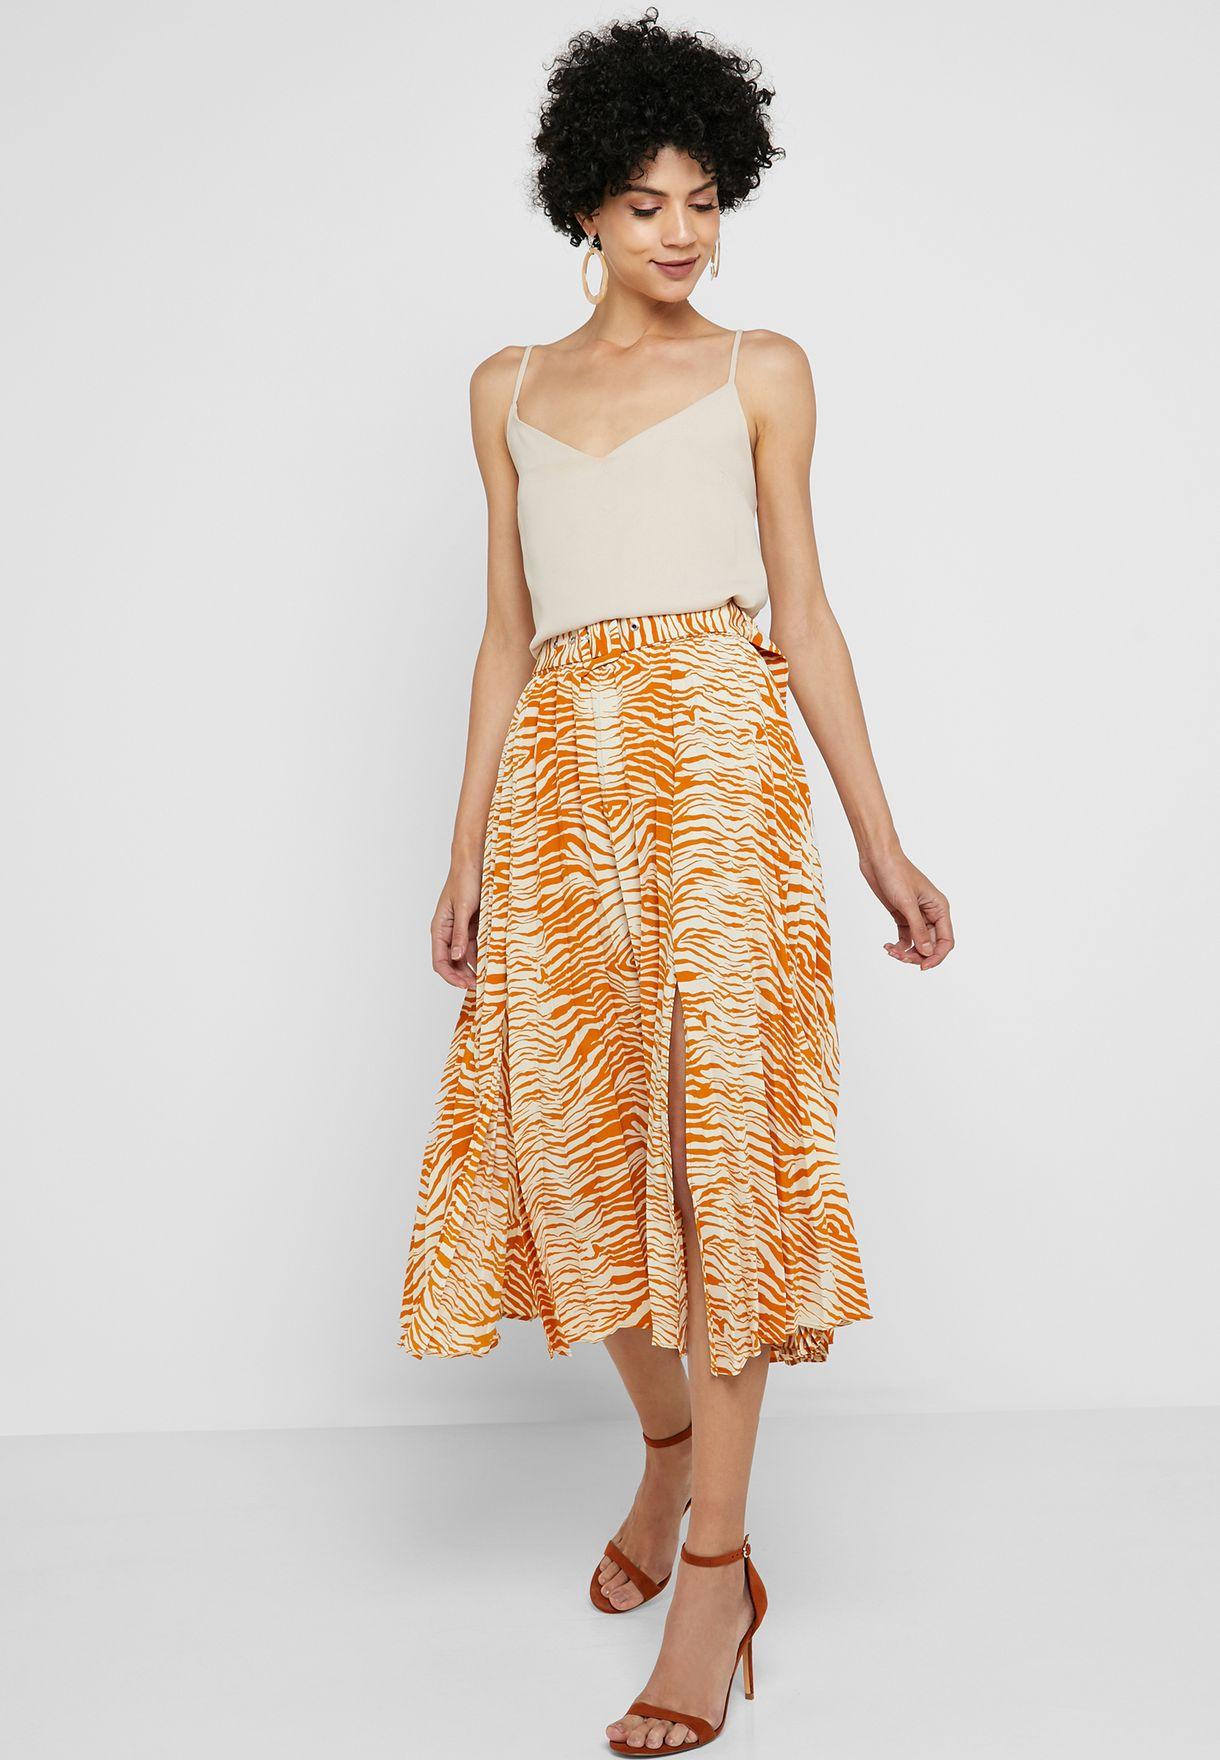 50% off enjoy free shipping superior quality Zebra Print Belted Midi Skirt